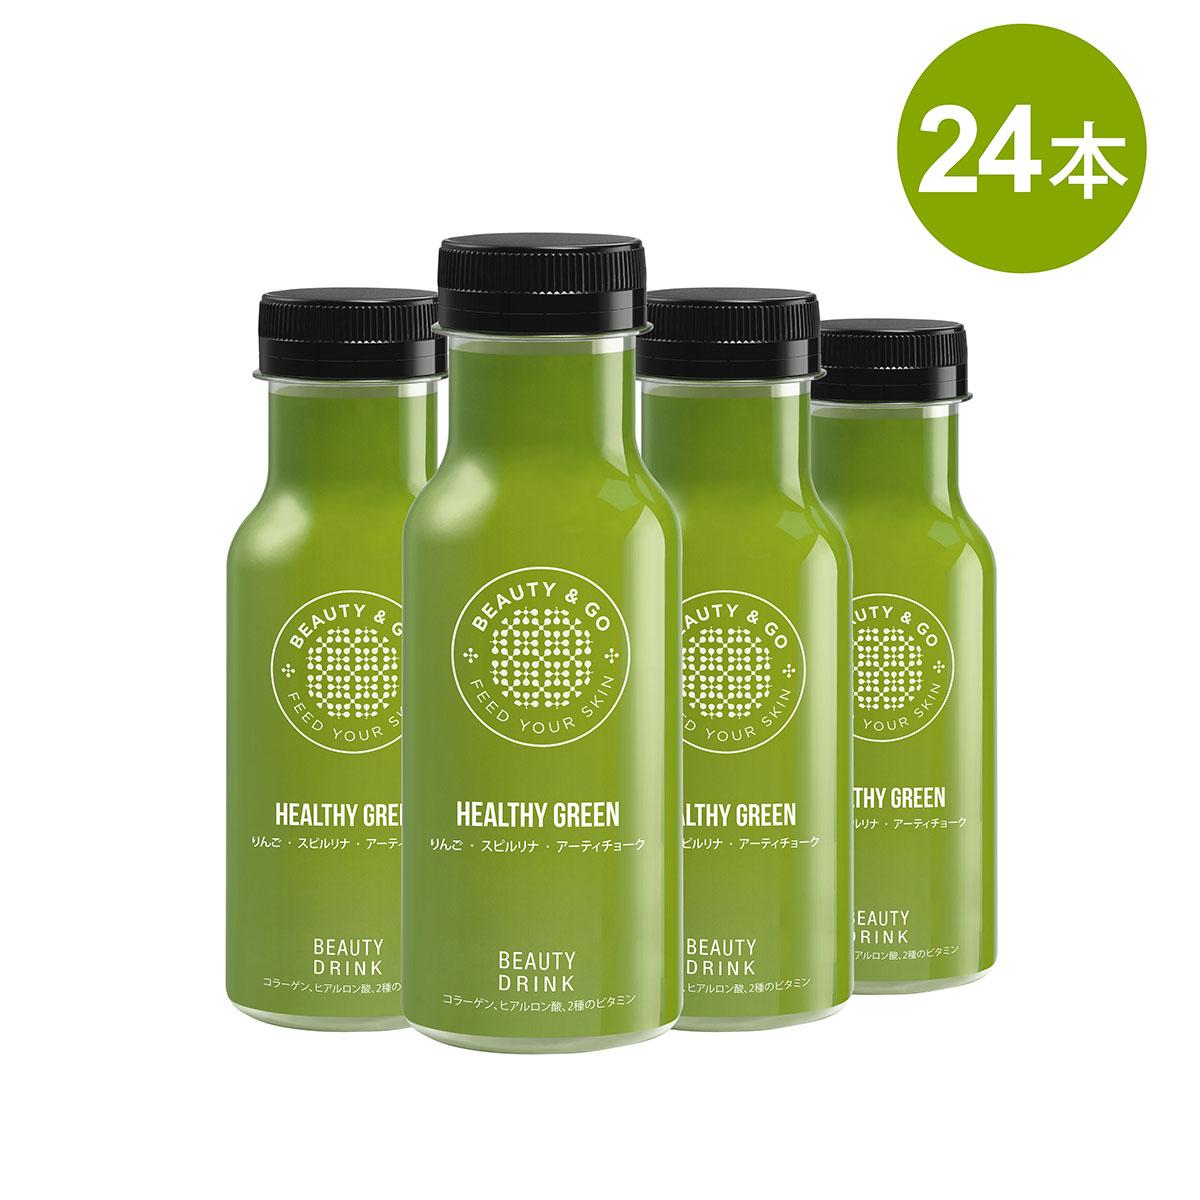 BEAUTYGO HEALTHY 通信販売 GREEN ヘルシーグリーン 24本 ― 日本限定 美容ドリンク 24日間のケア